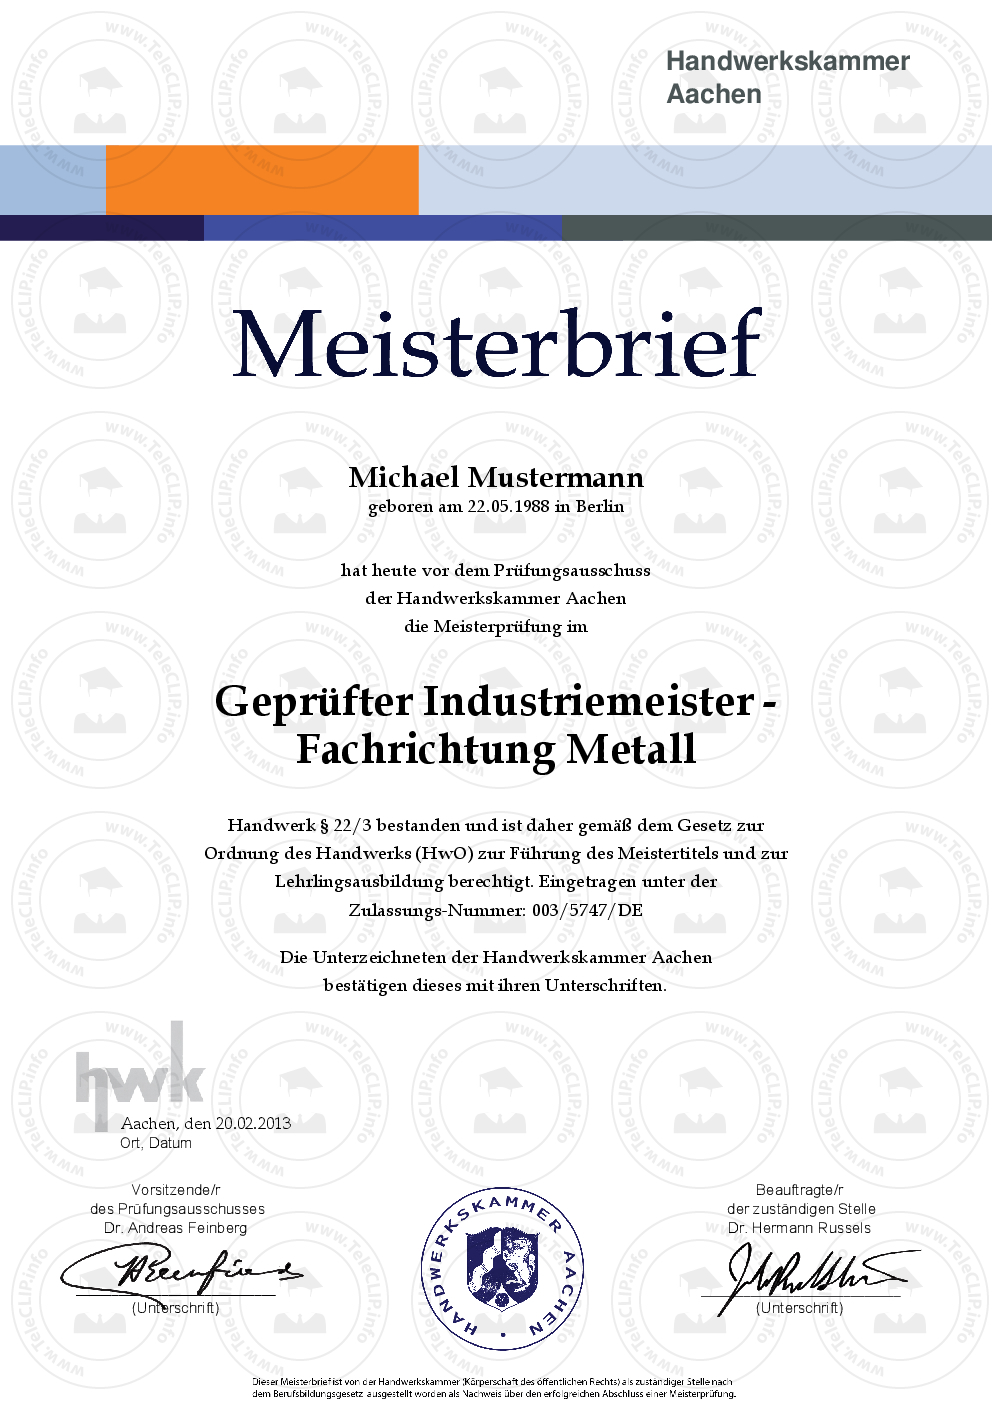 hwk_meisterbrief_6b